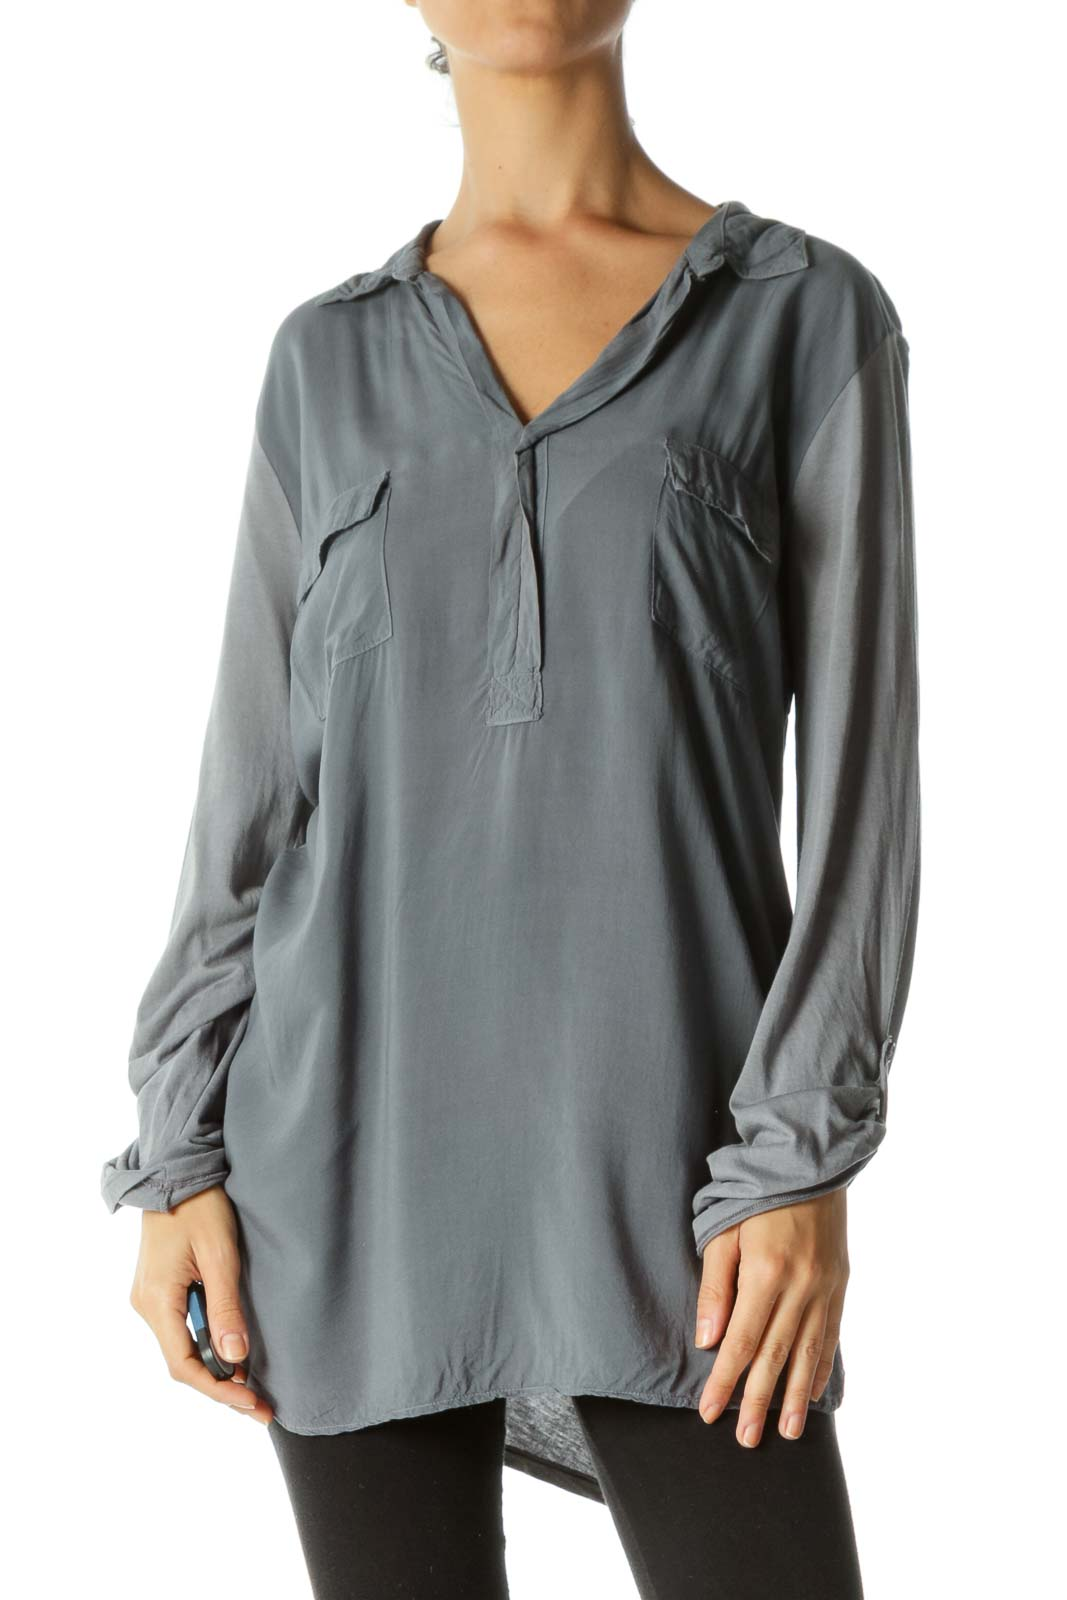 Gray Supima Cotton Blend Pocketed V-Neck Long Sleeve Light Top